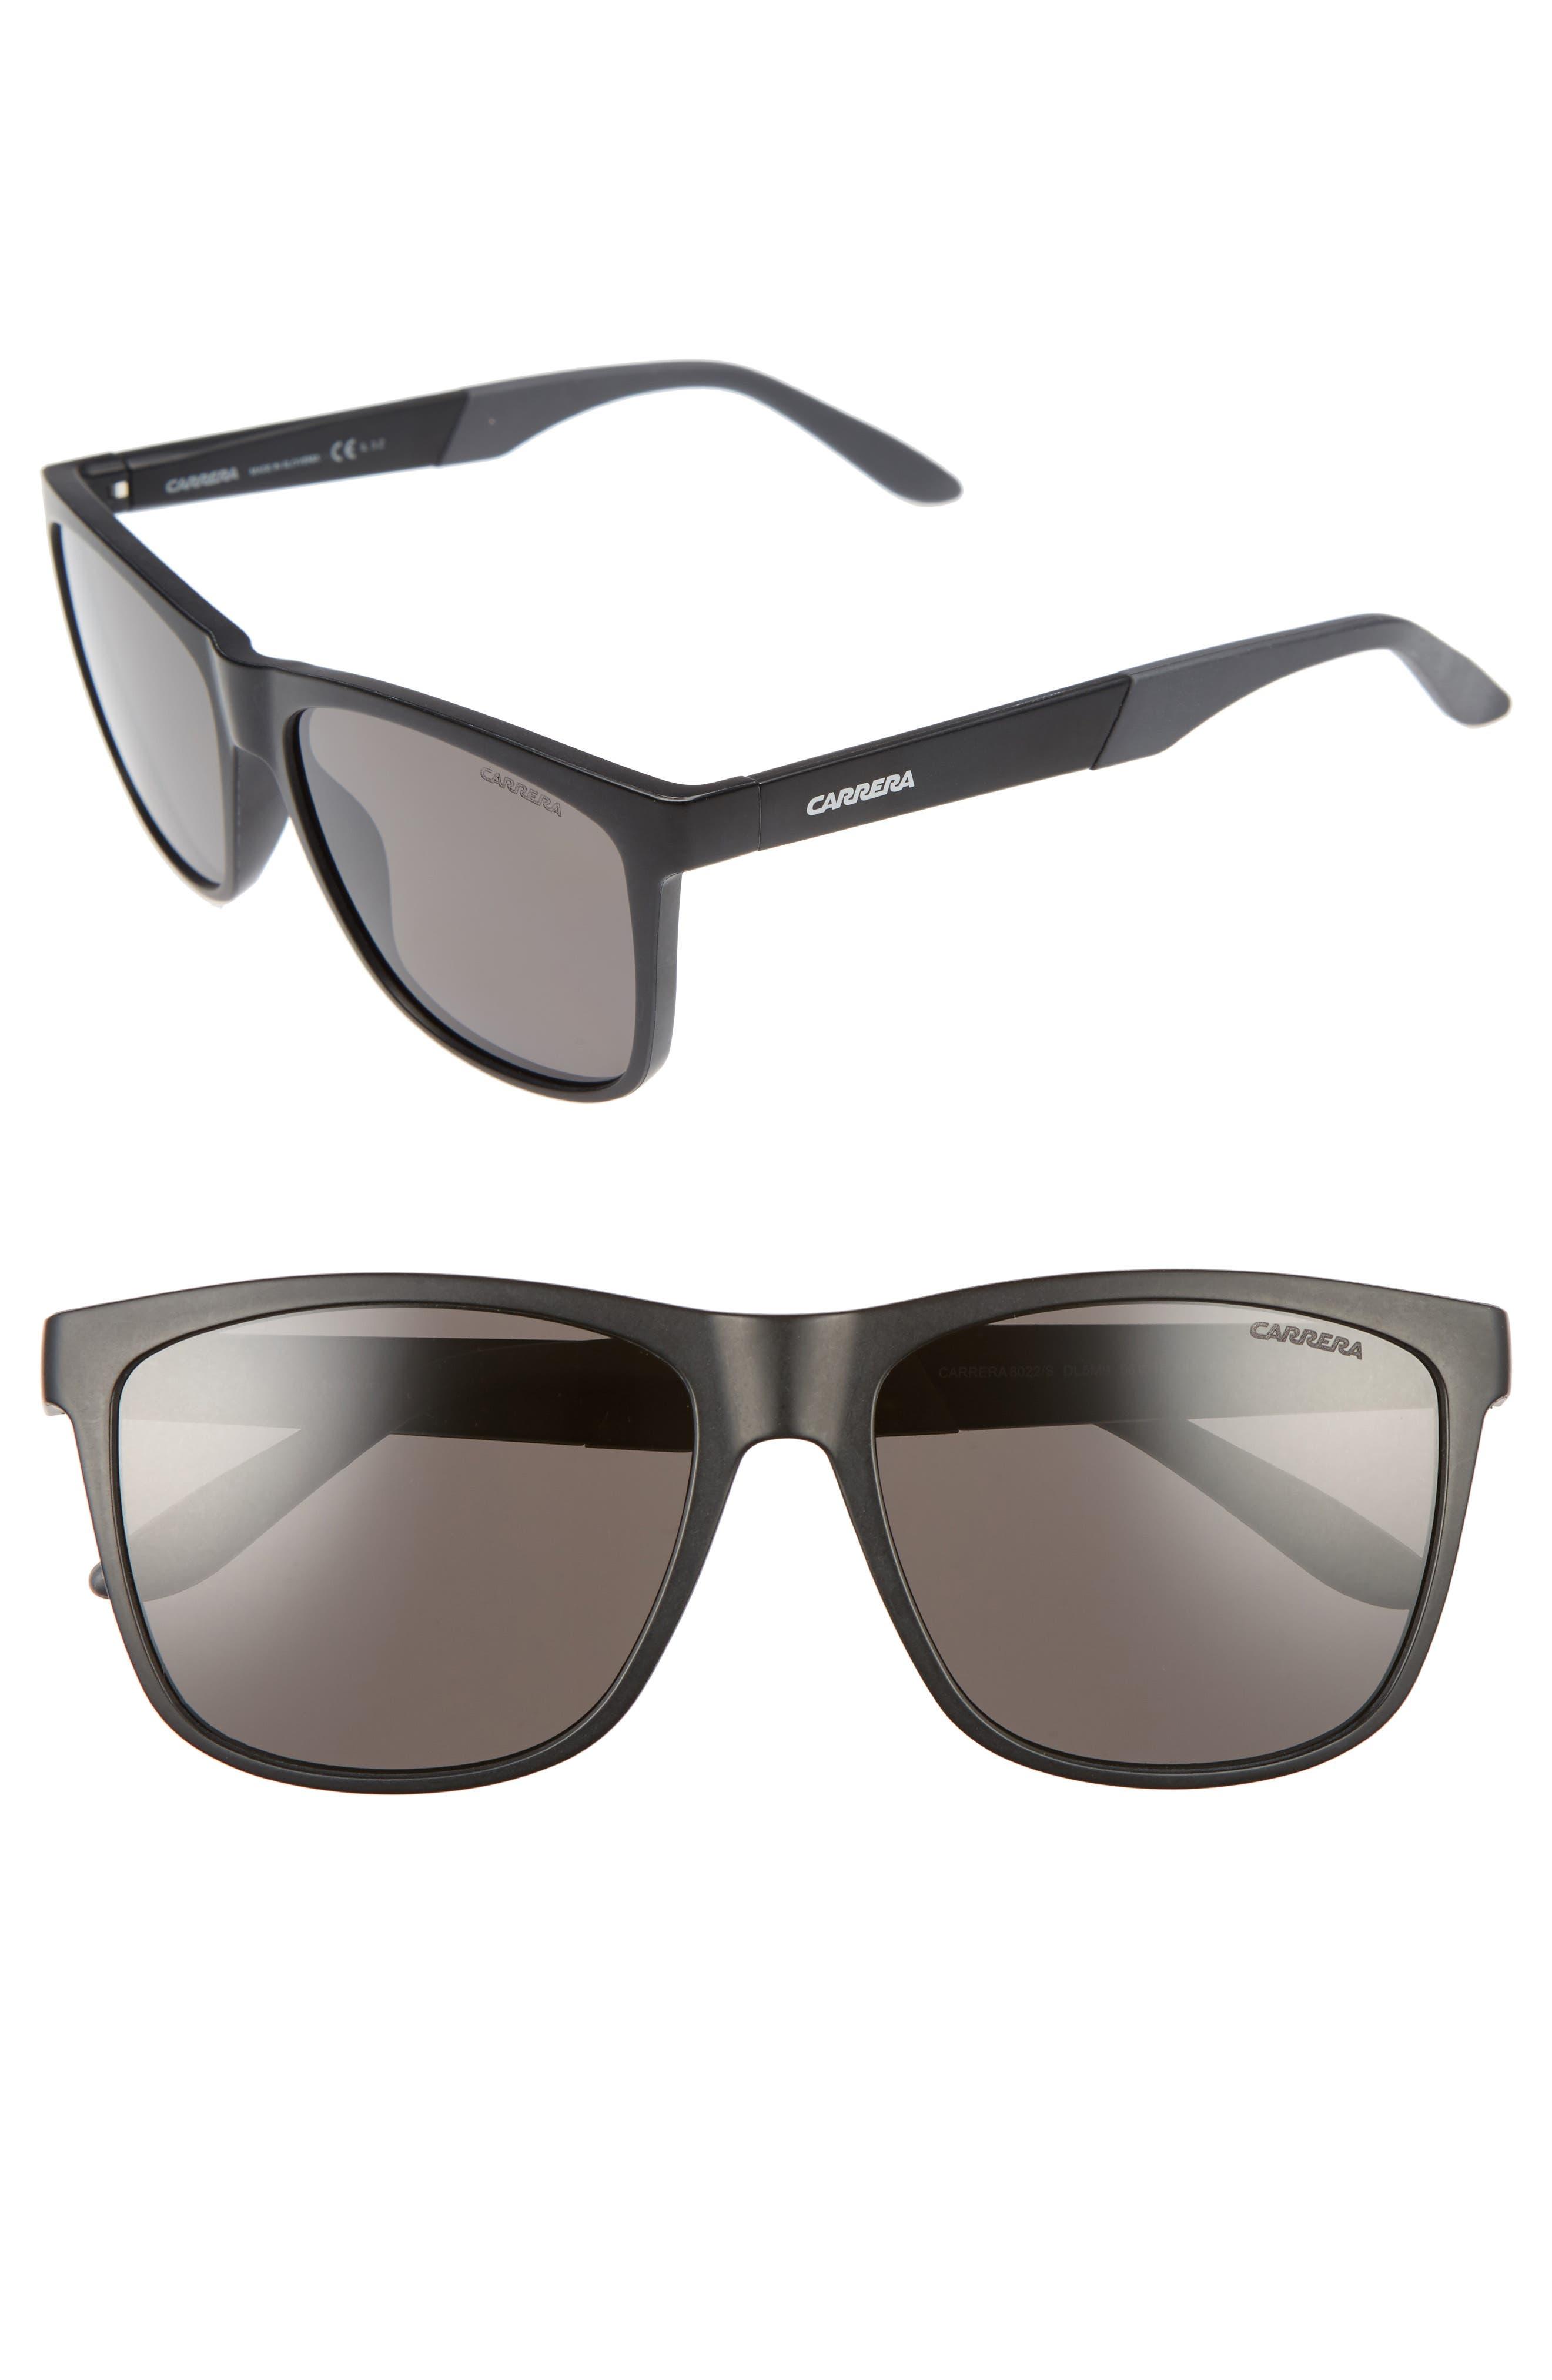 Carerra Eyewear 56mm Retro Polarized Sunglasses,                             Main thumbnail 1, color,                             001